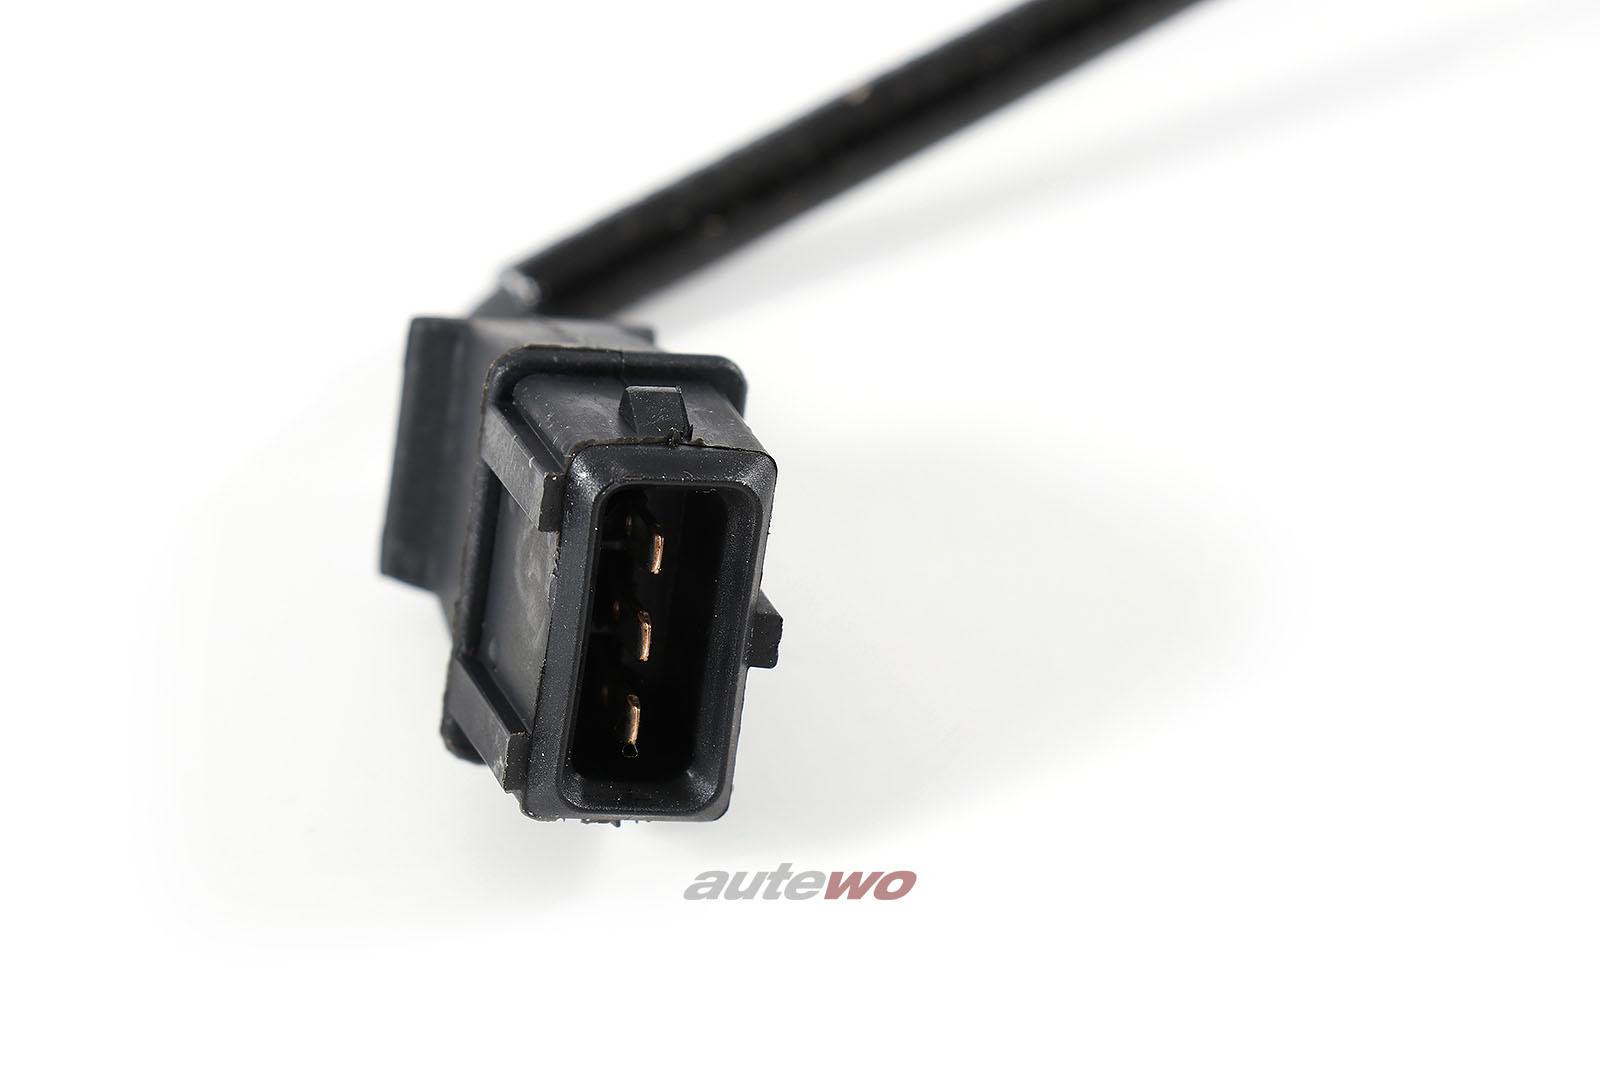 Bosch 0232101020 Audi S2/RS2/S4/S6 C4 20V Turbo Hallgeber entspricht 034905161